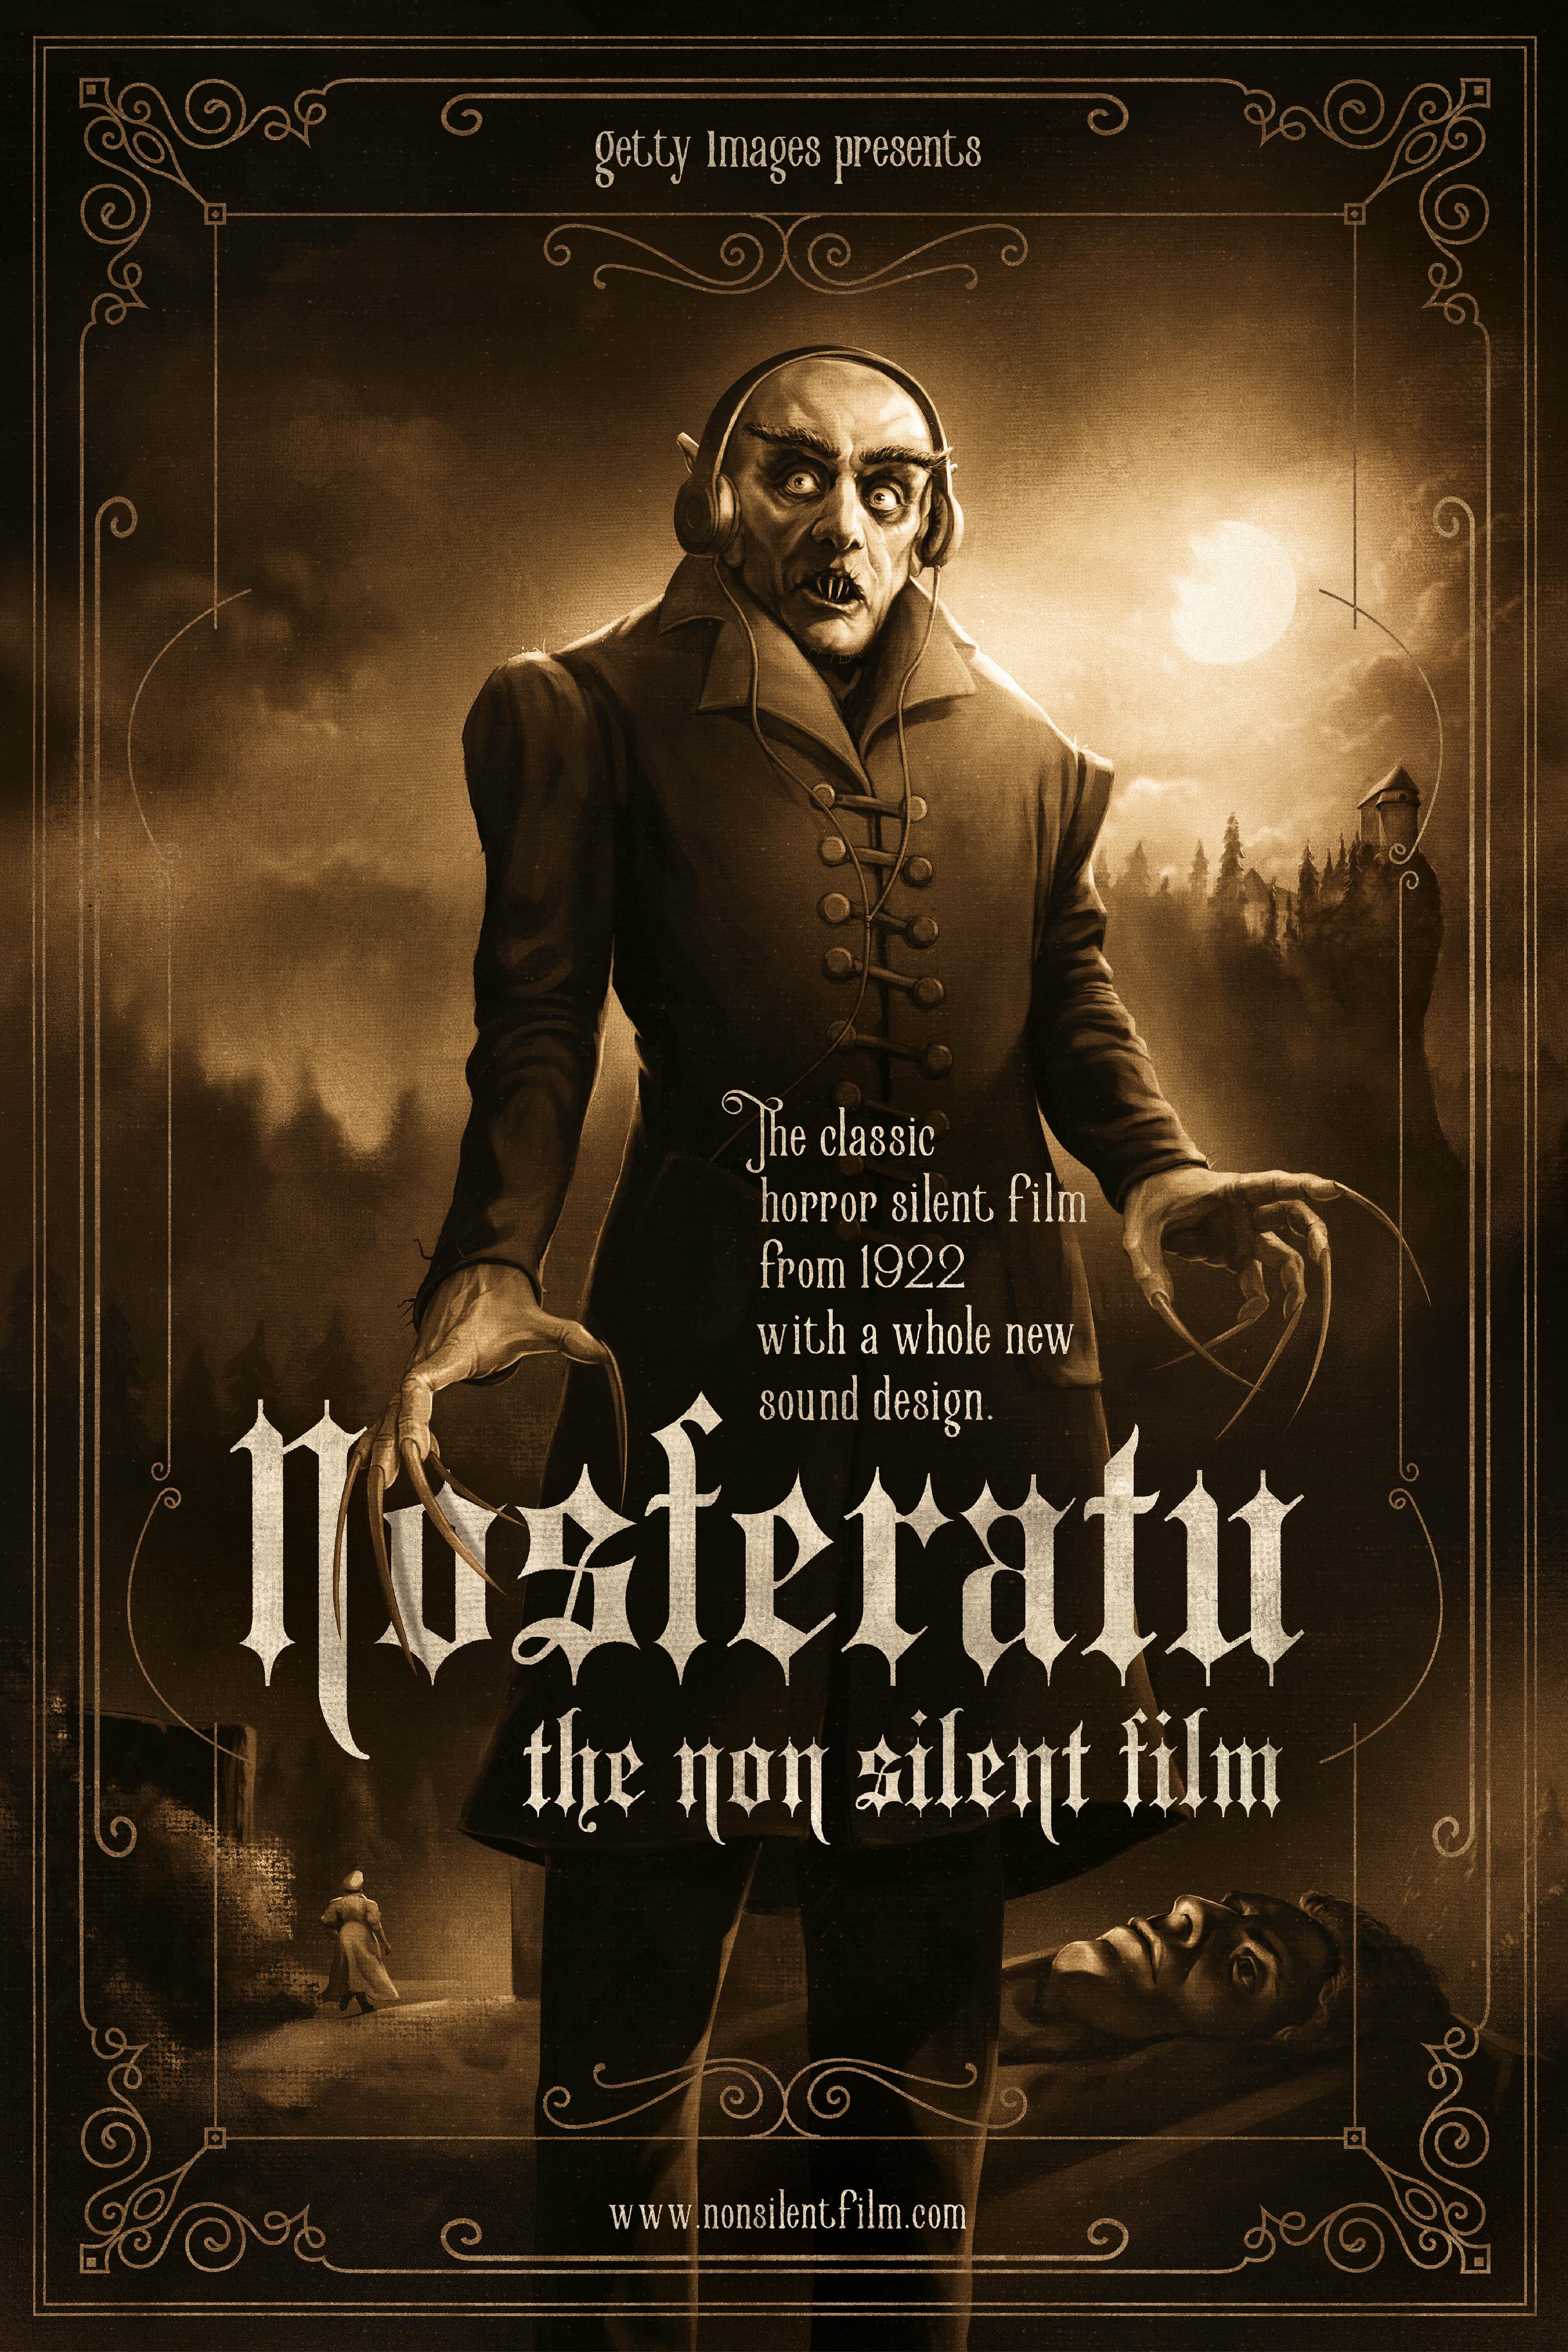 Nosferatu the Nonsilent Film poster by Black Madre Atelier, 2017